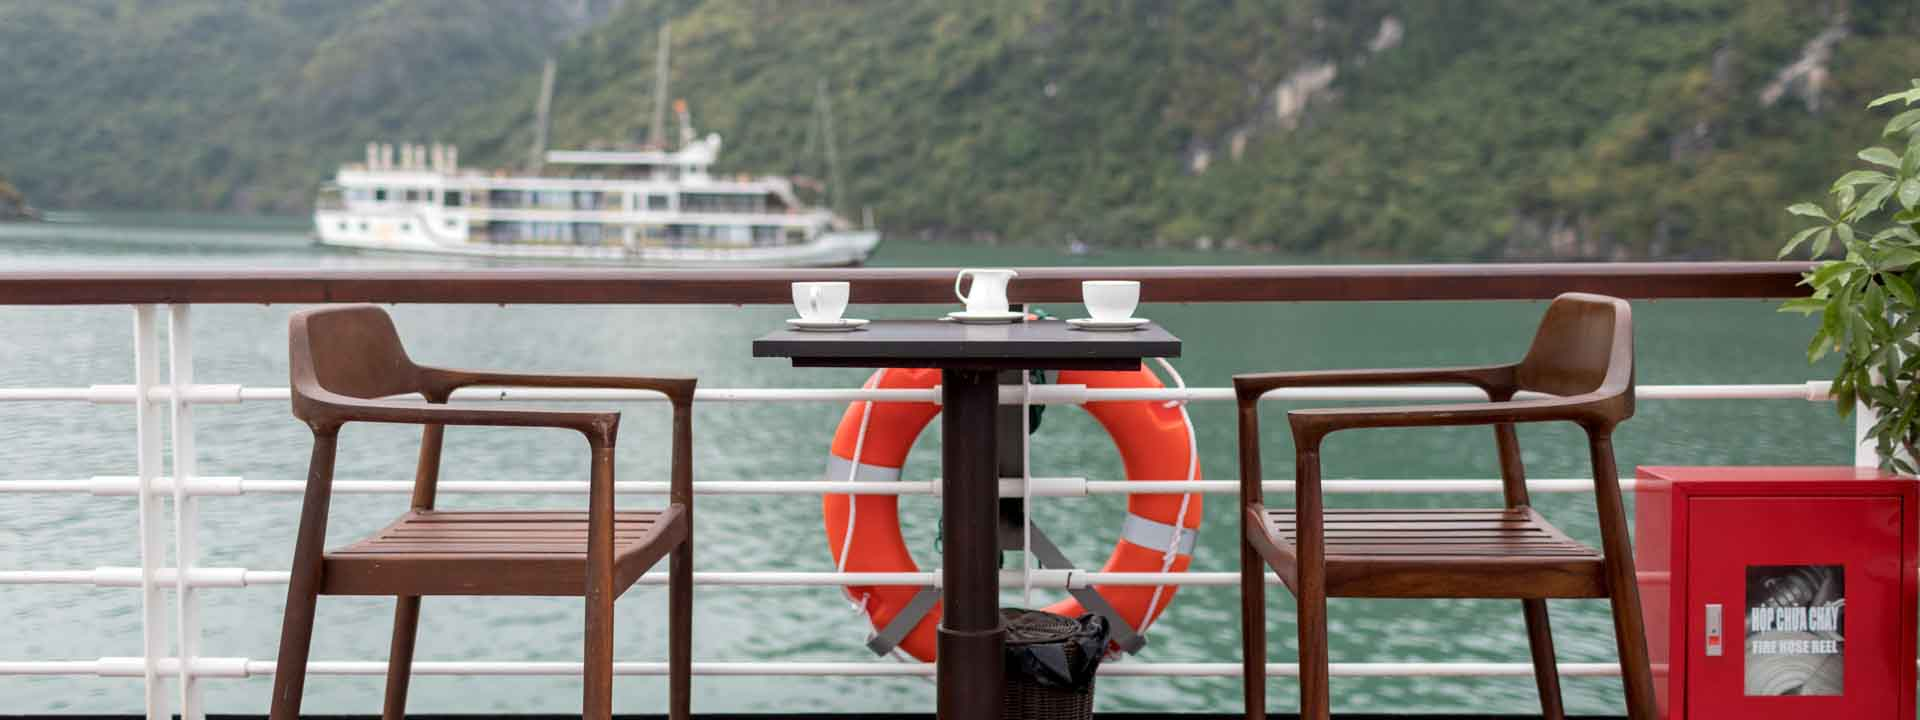 Bai Tho Victory Cruise 3 days